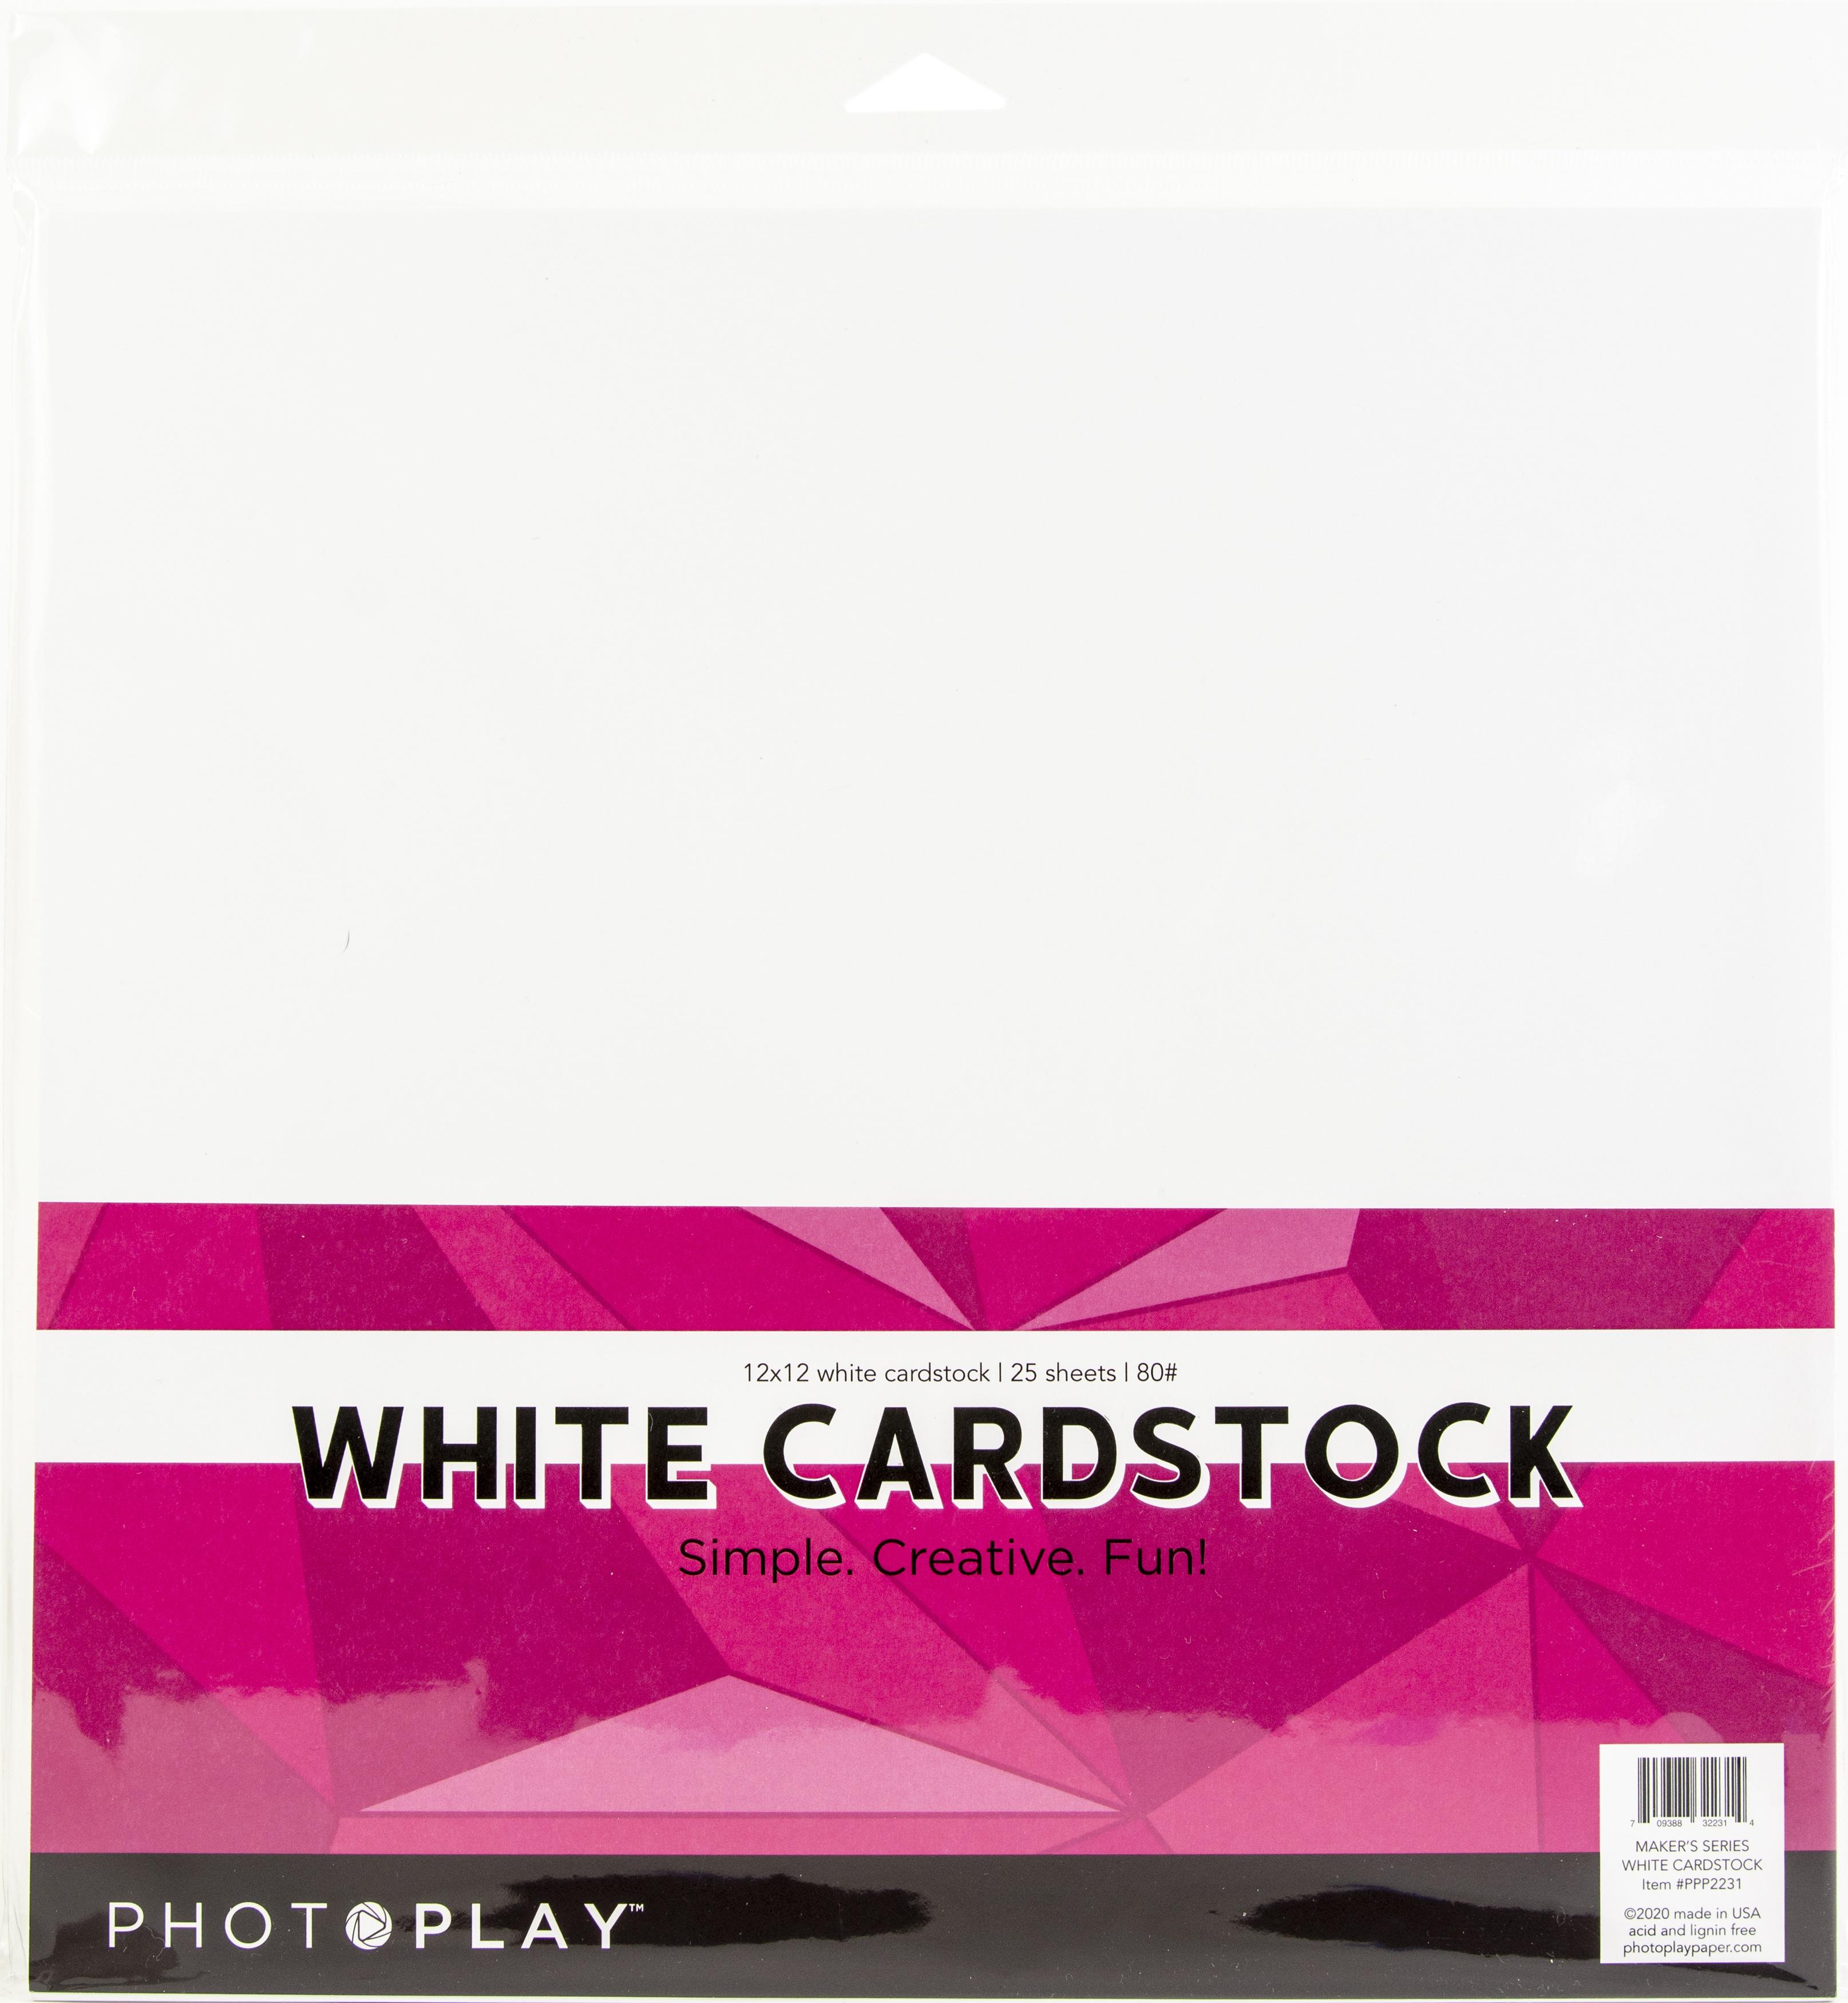 PhotoPlay Maker Series 80lb Cardstock 12X12 25/Pkg-White